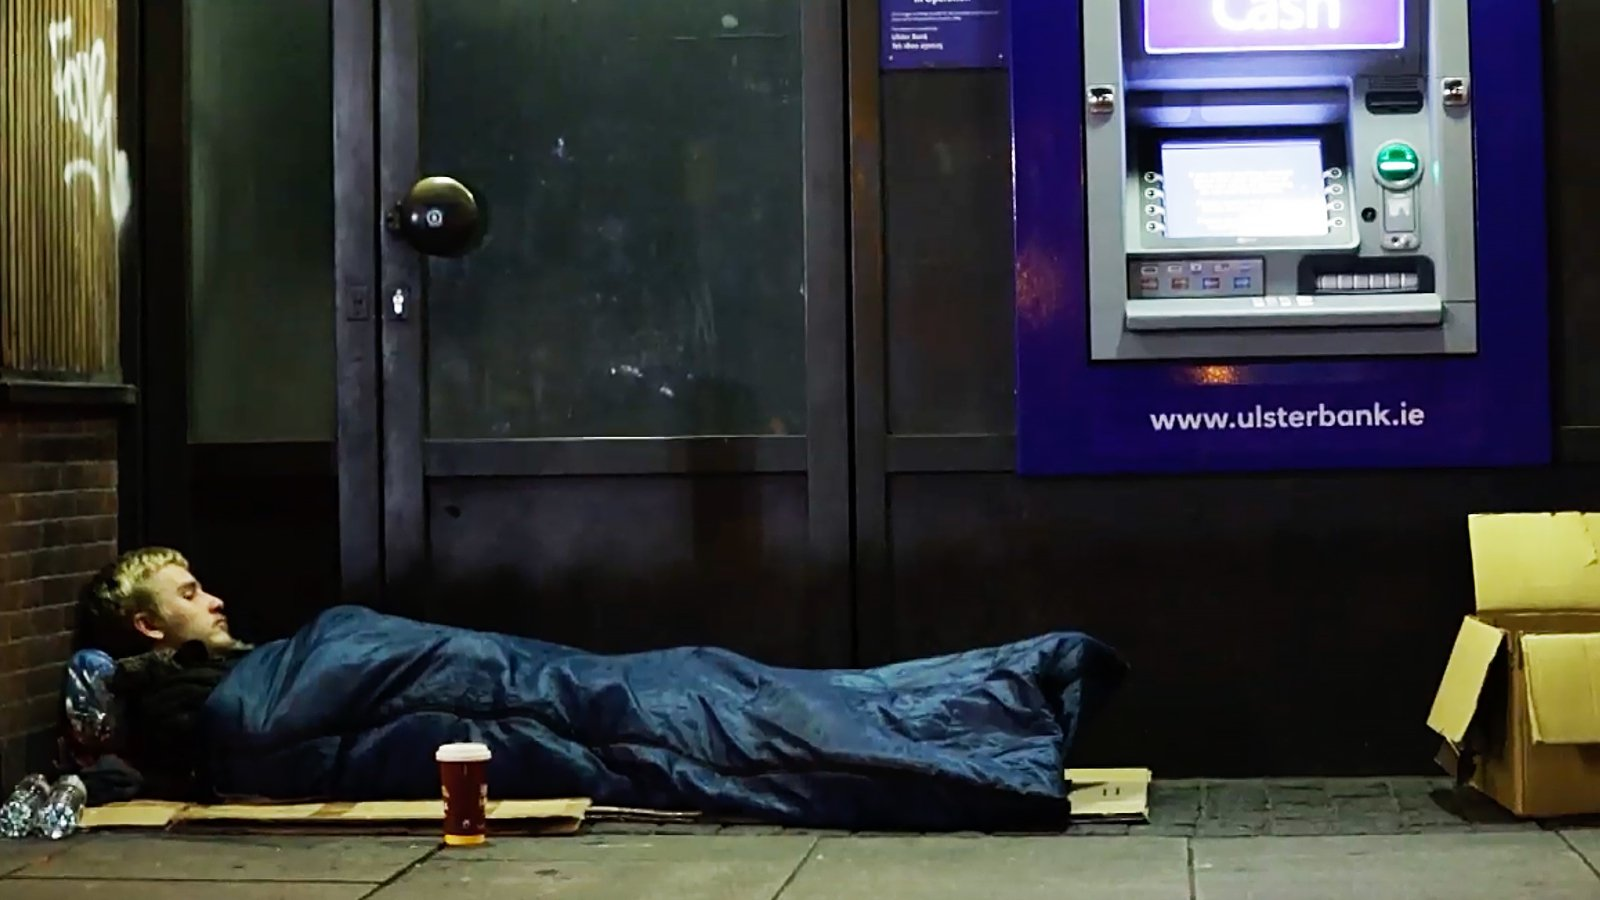 Image - Dan Orlovs left Kildare to live on the streets of Dublin in July 2020